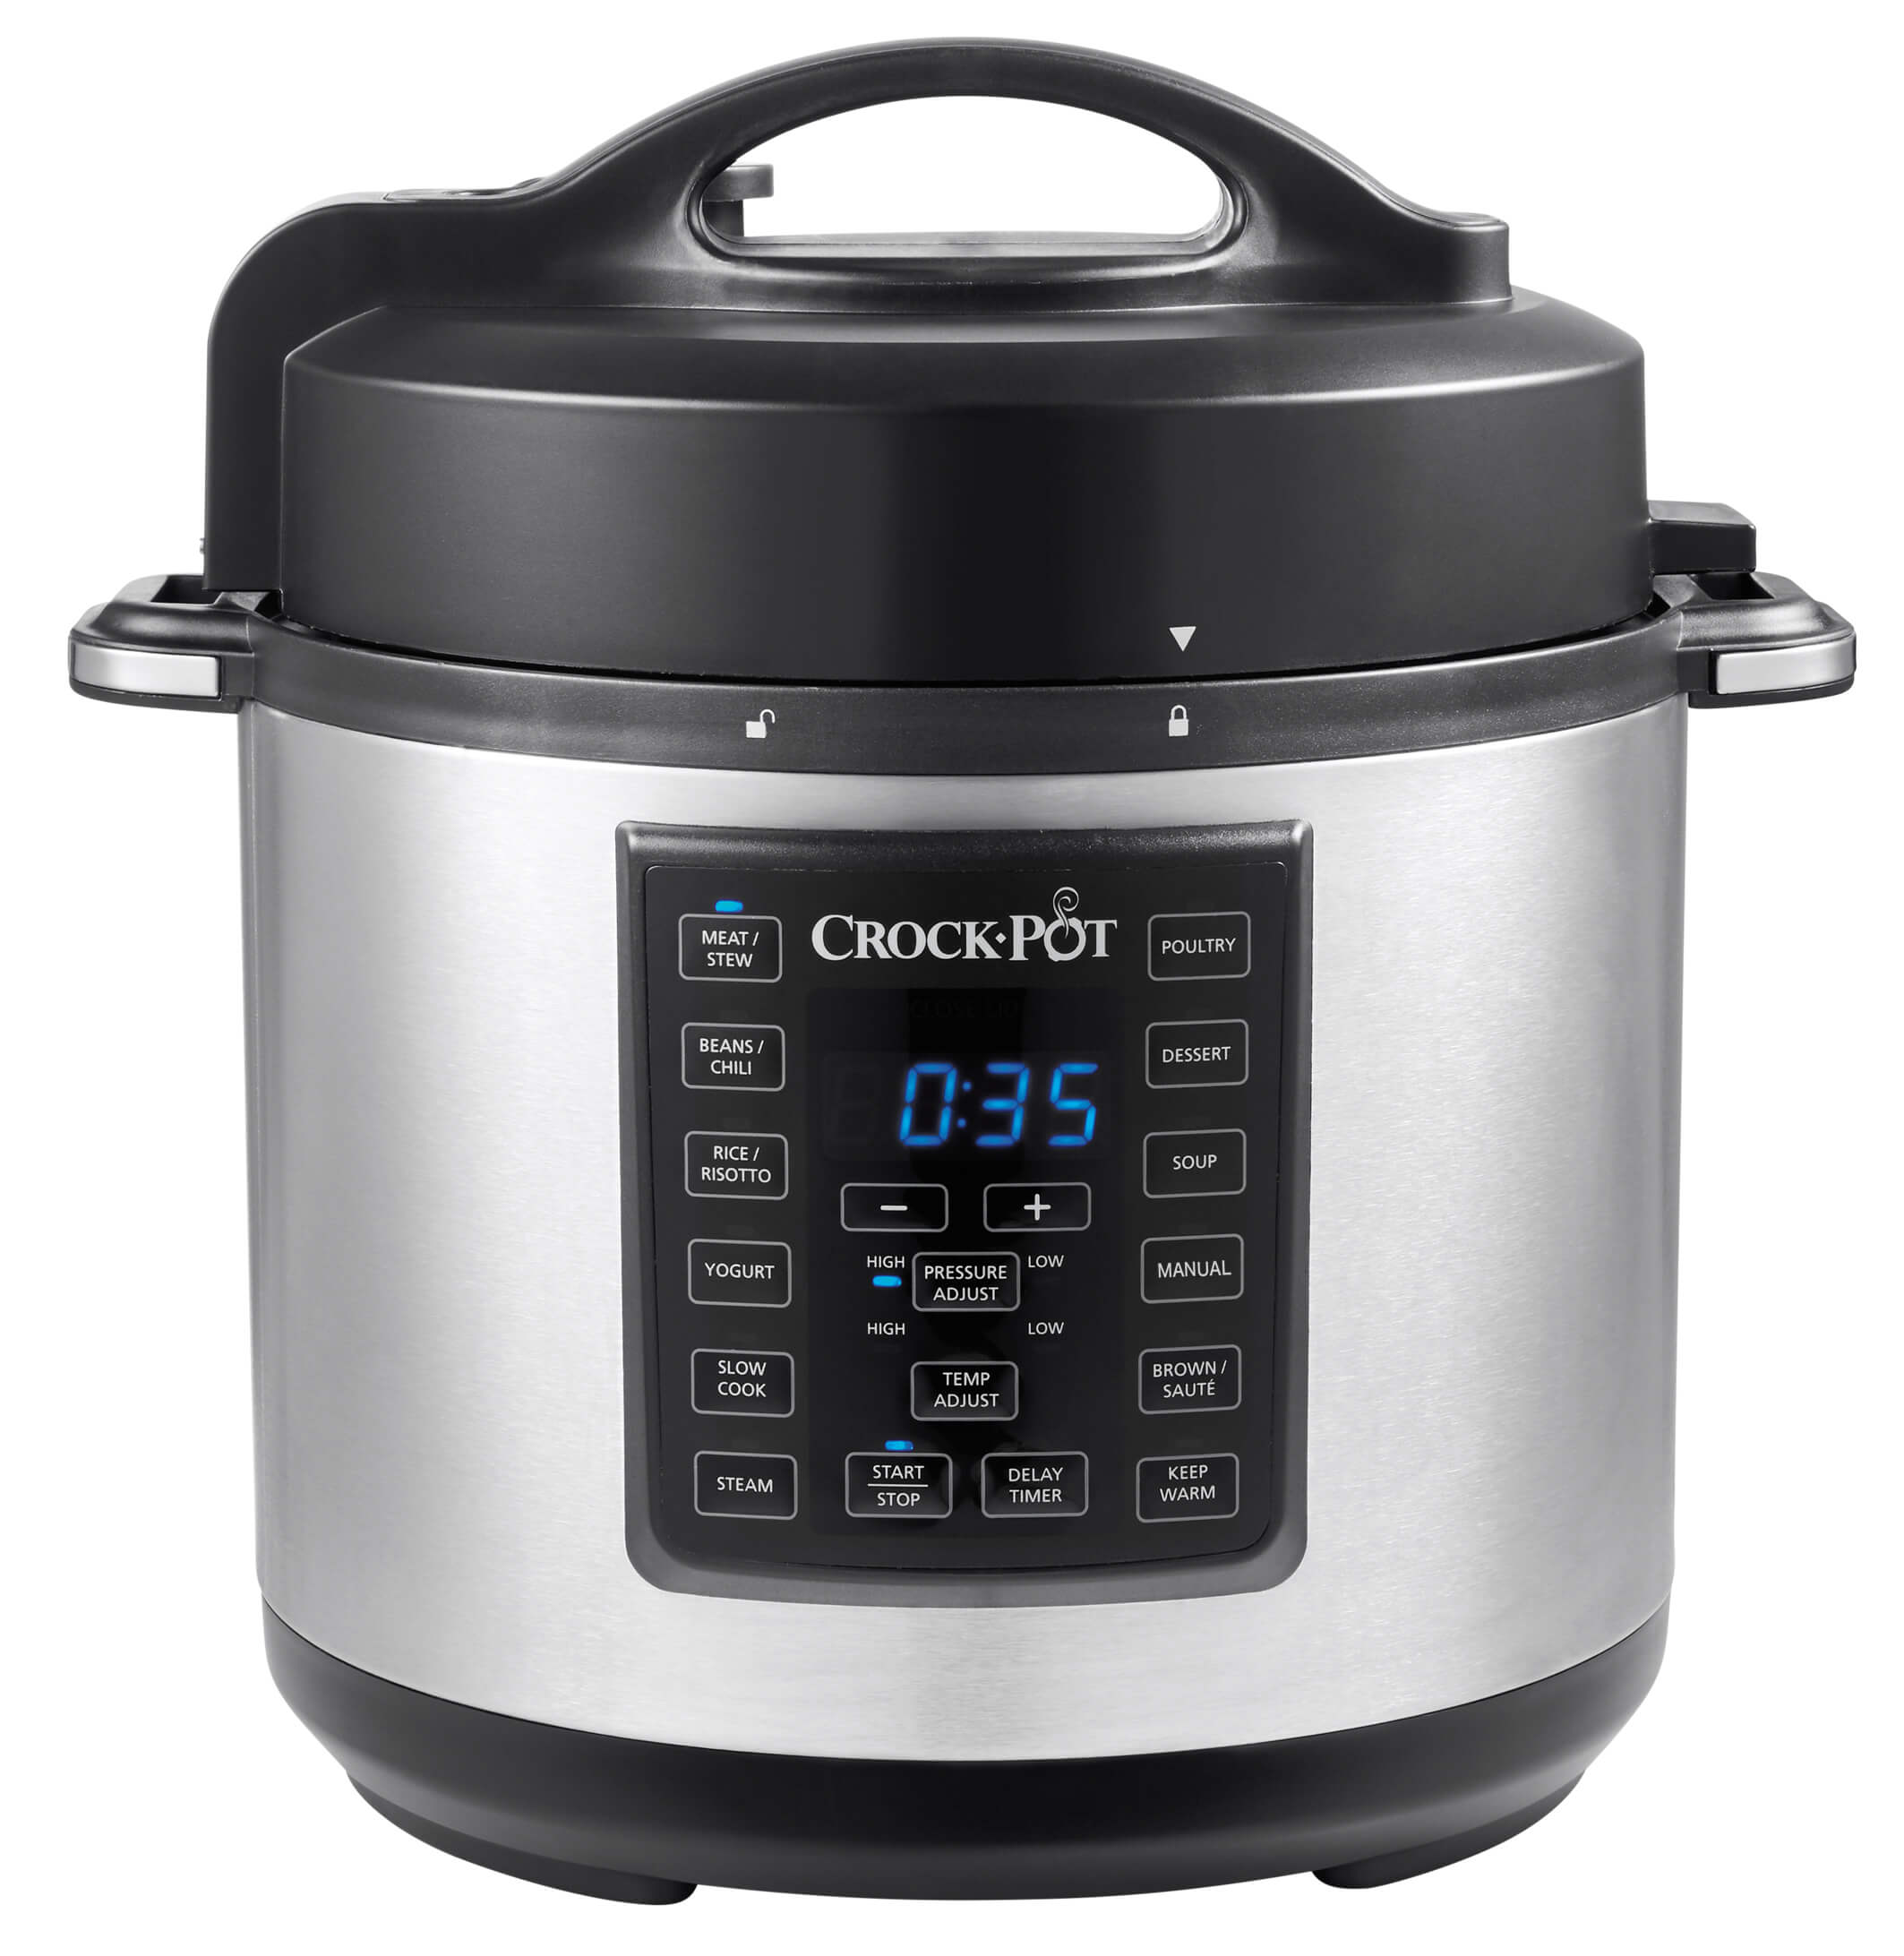 Crock Pot 5,7L Express Multicooker Rostfri